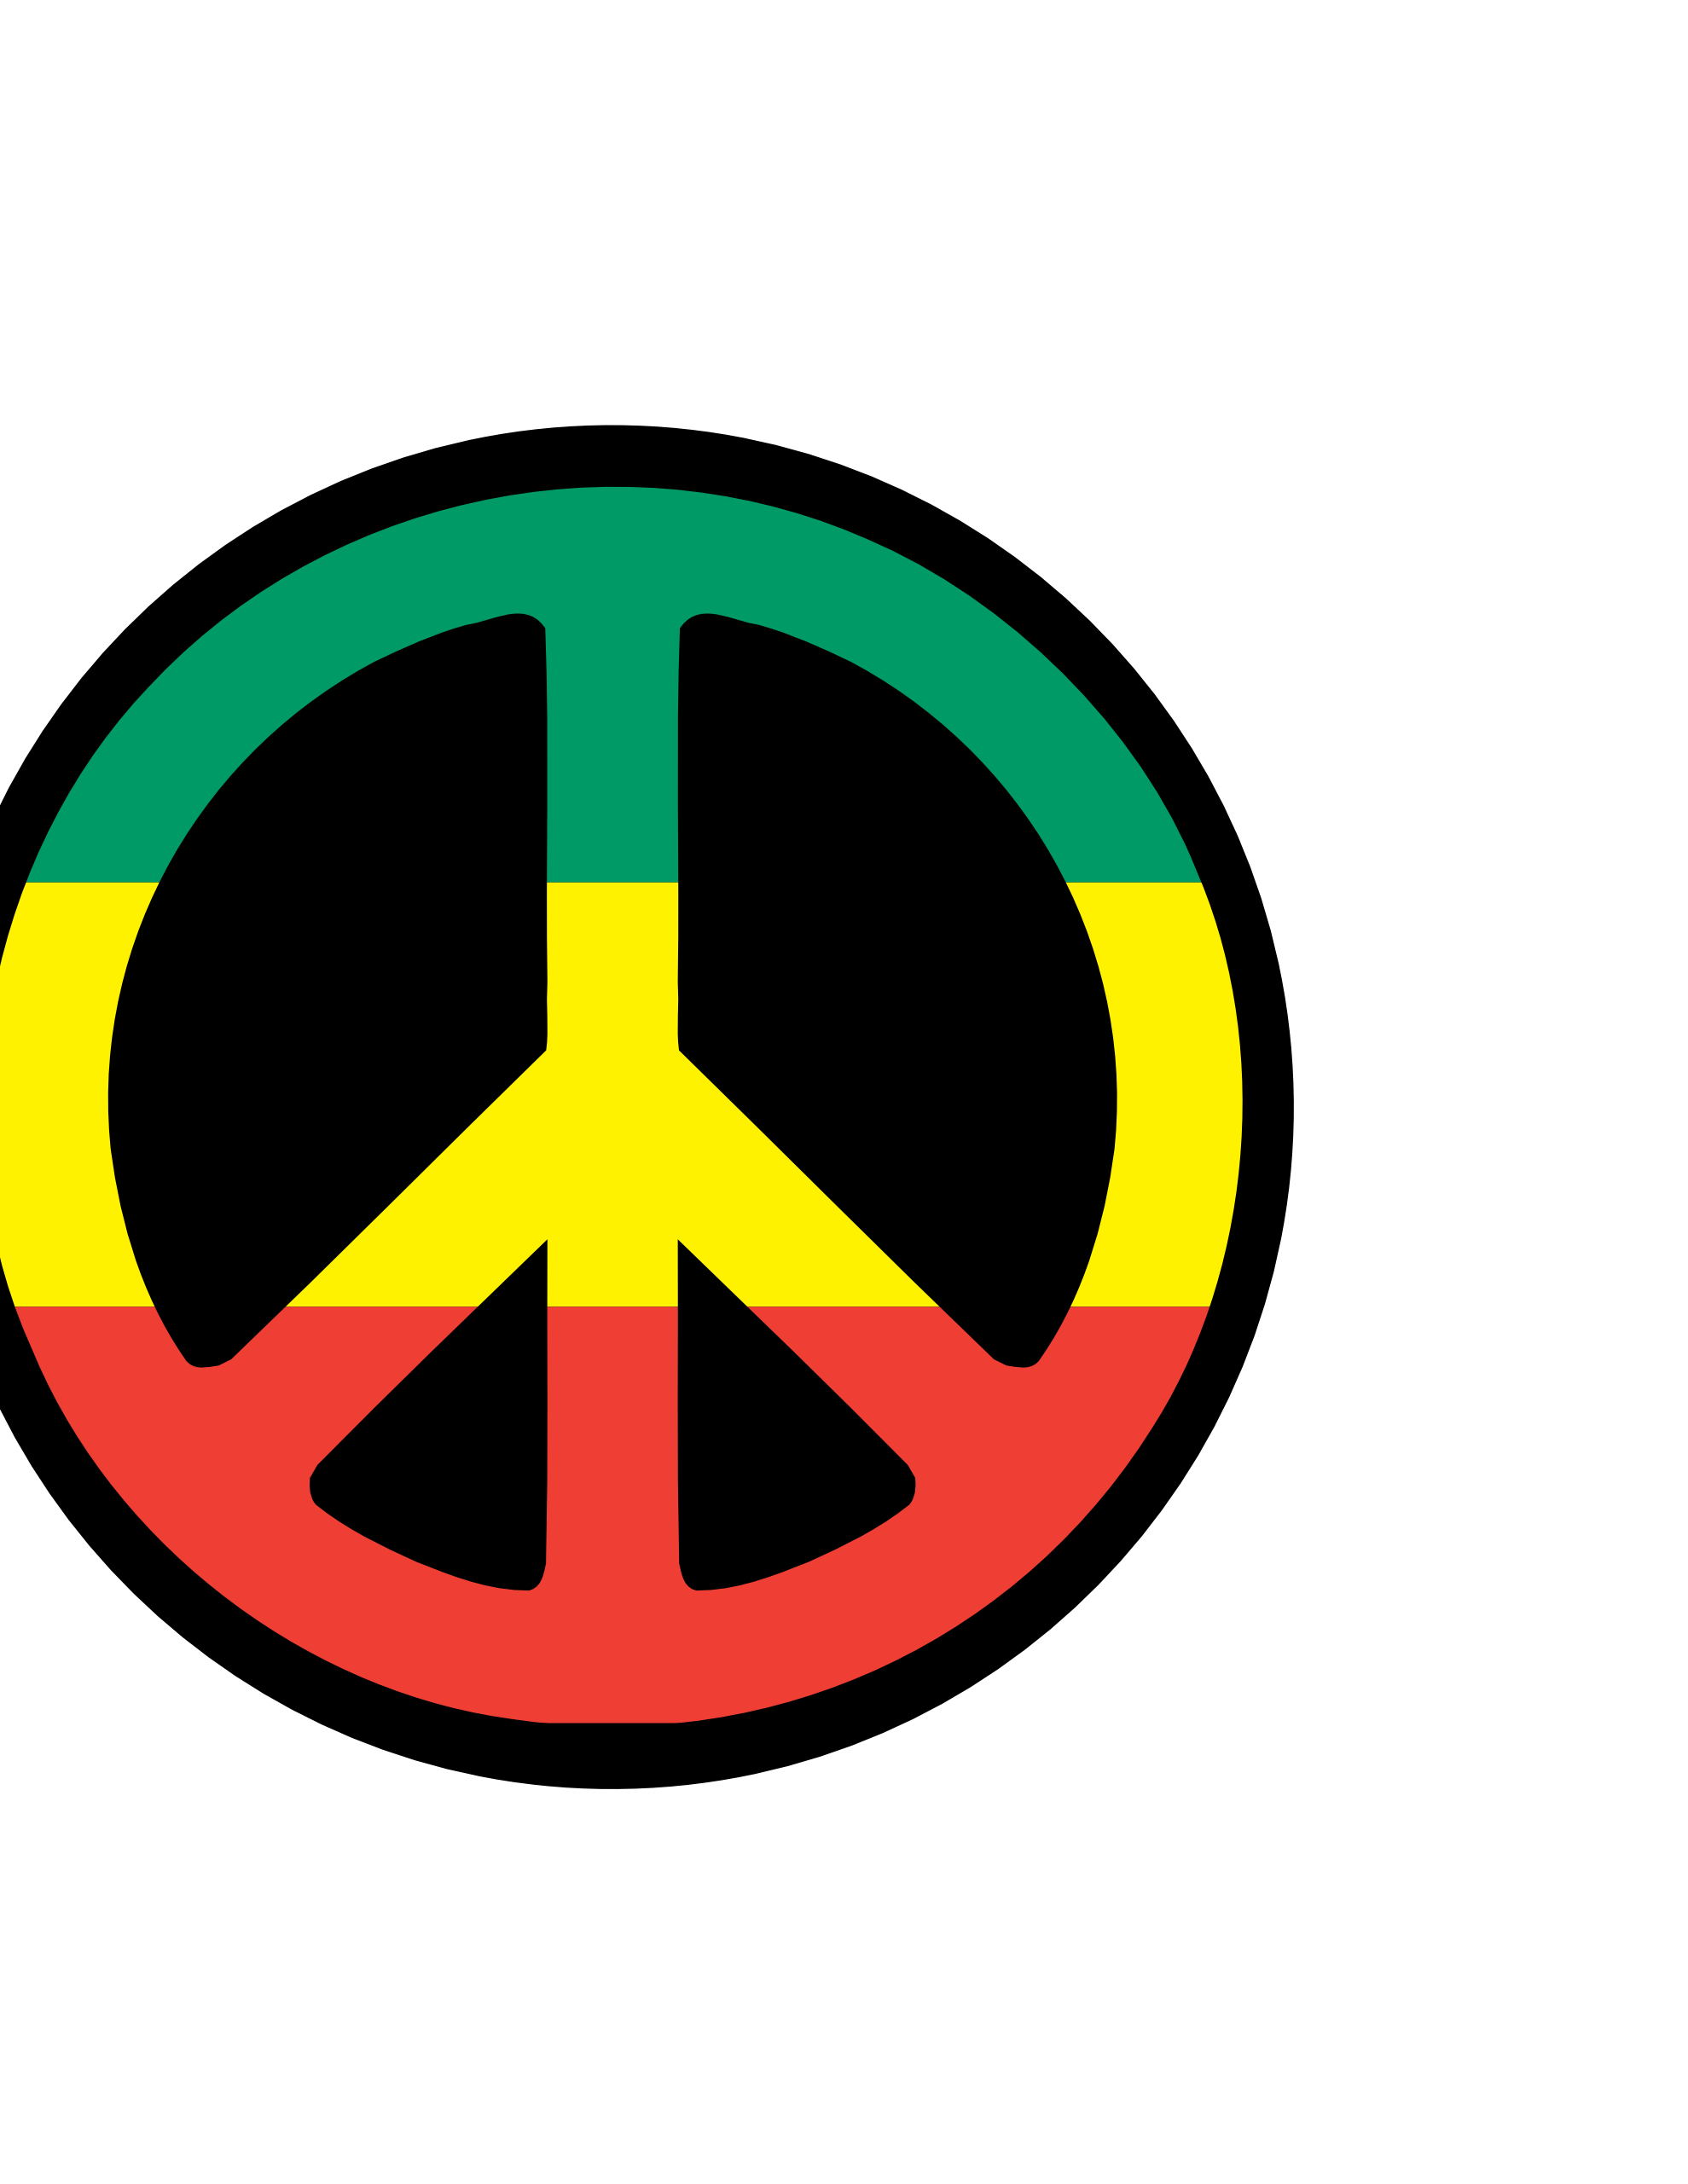 Rastafari movement symbols choice image symbols and meanings rasta symbol biocorpaavc biocorpaavc Images